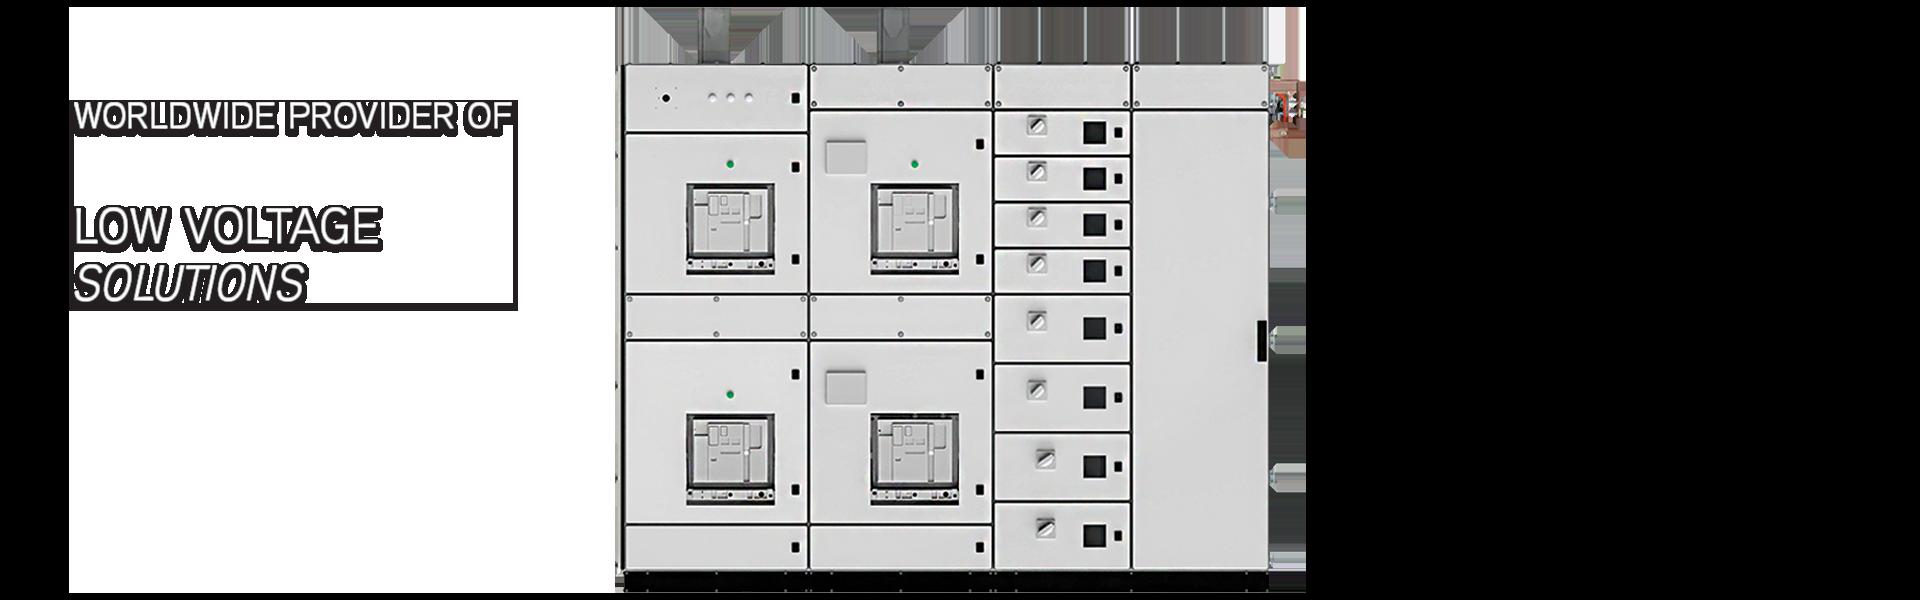 Logstrup Modular System, Switchboard